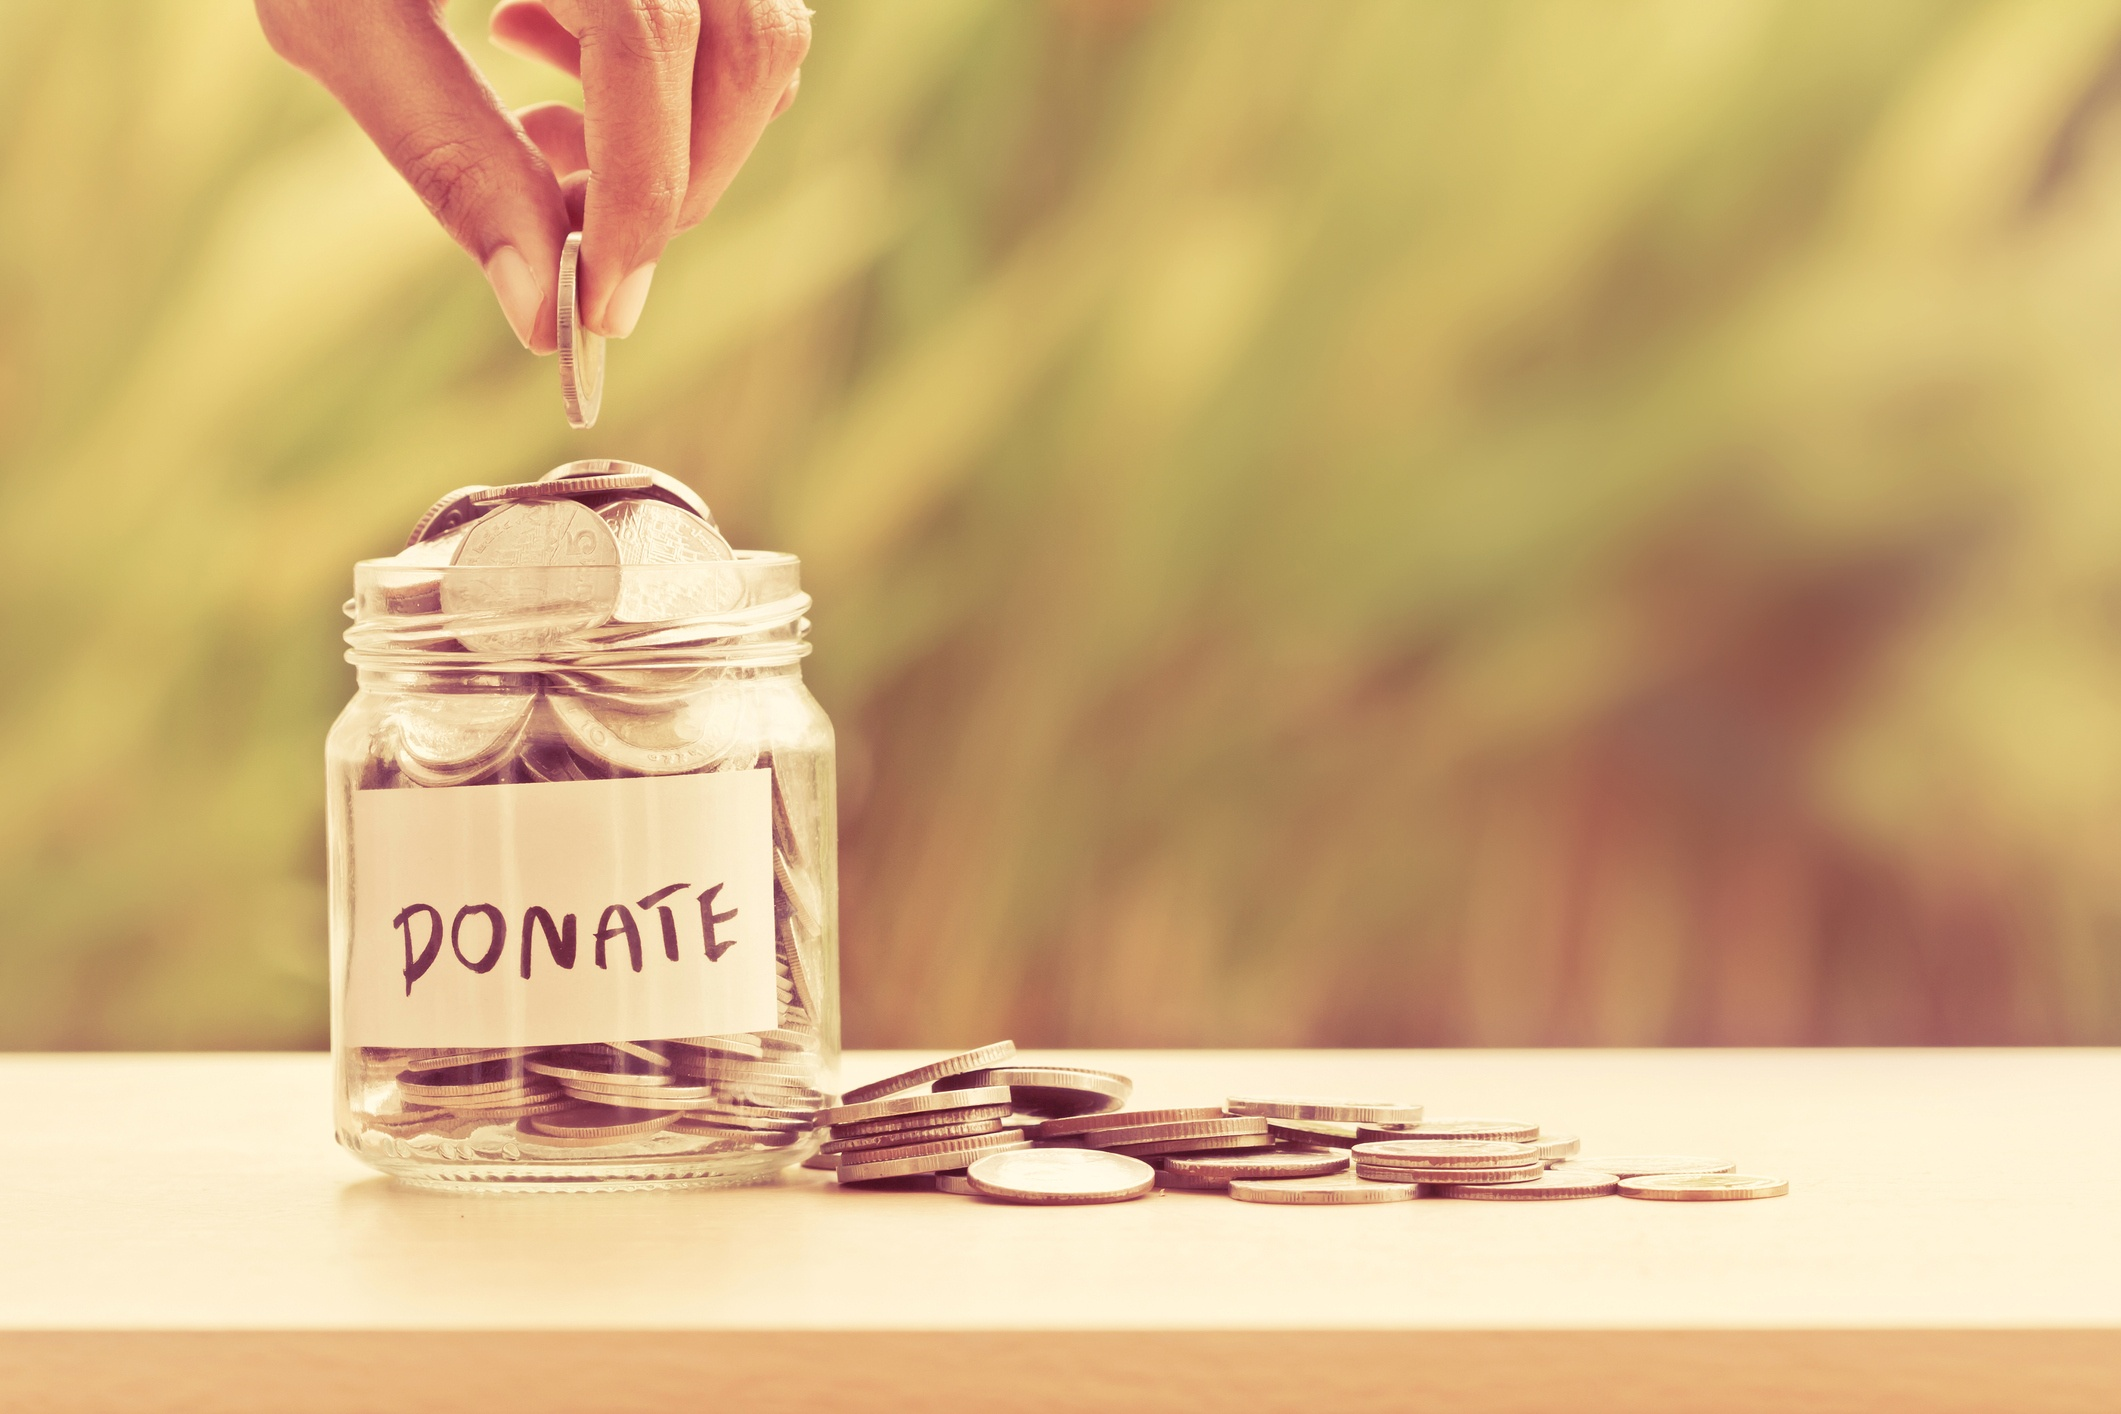 Donation jar.jpg